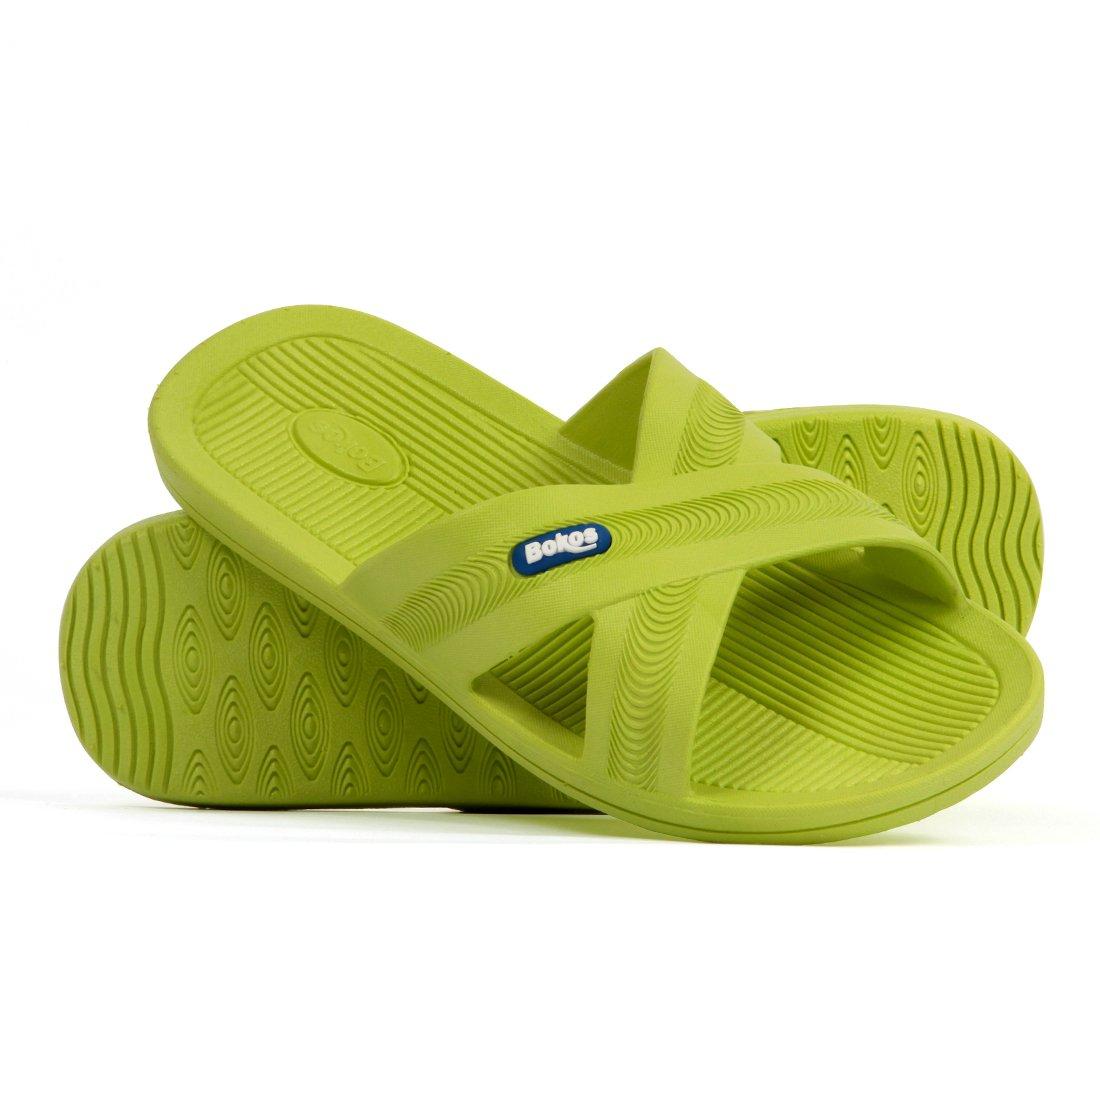 Bokos Women's Rubber Slide Sandals B00GPQIBX6 8 B(M) US|Green Apple